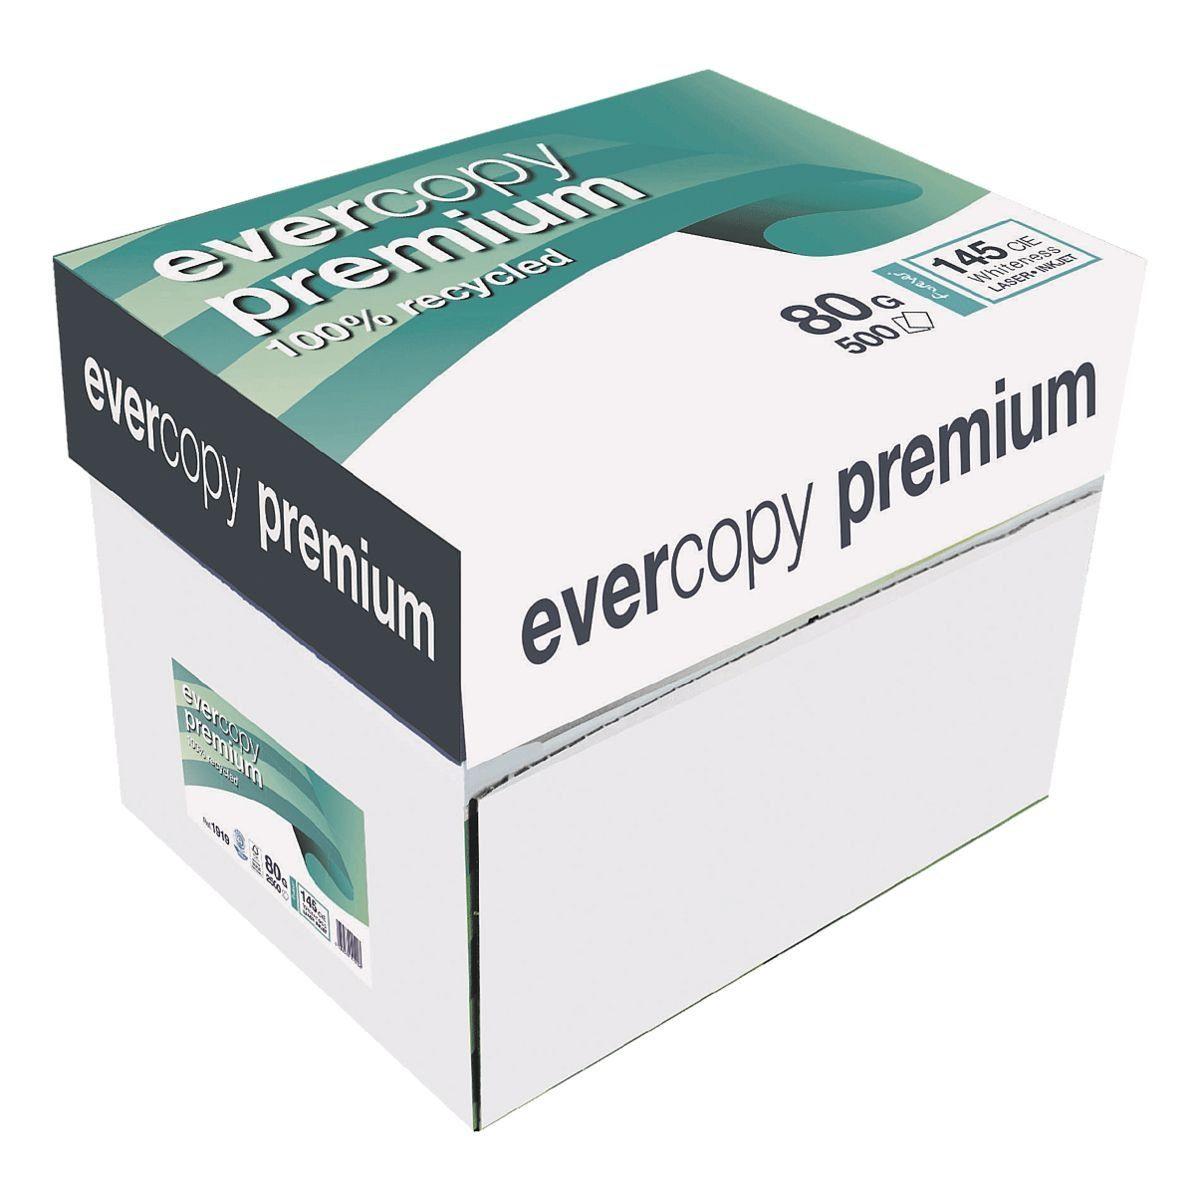 Clairefontaine Öko-Box Recycling Kopierpapier »Everycopy Premium«